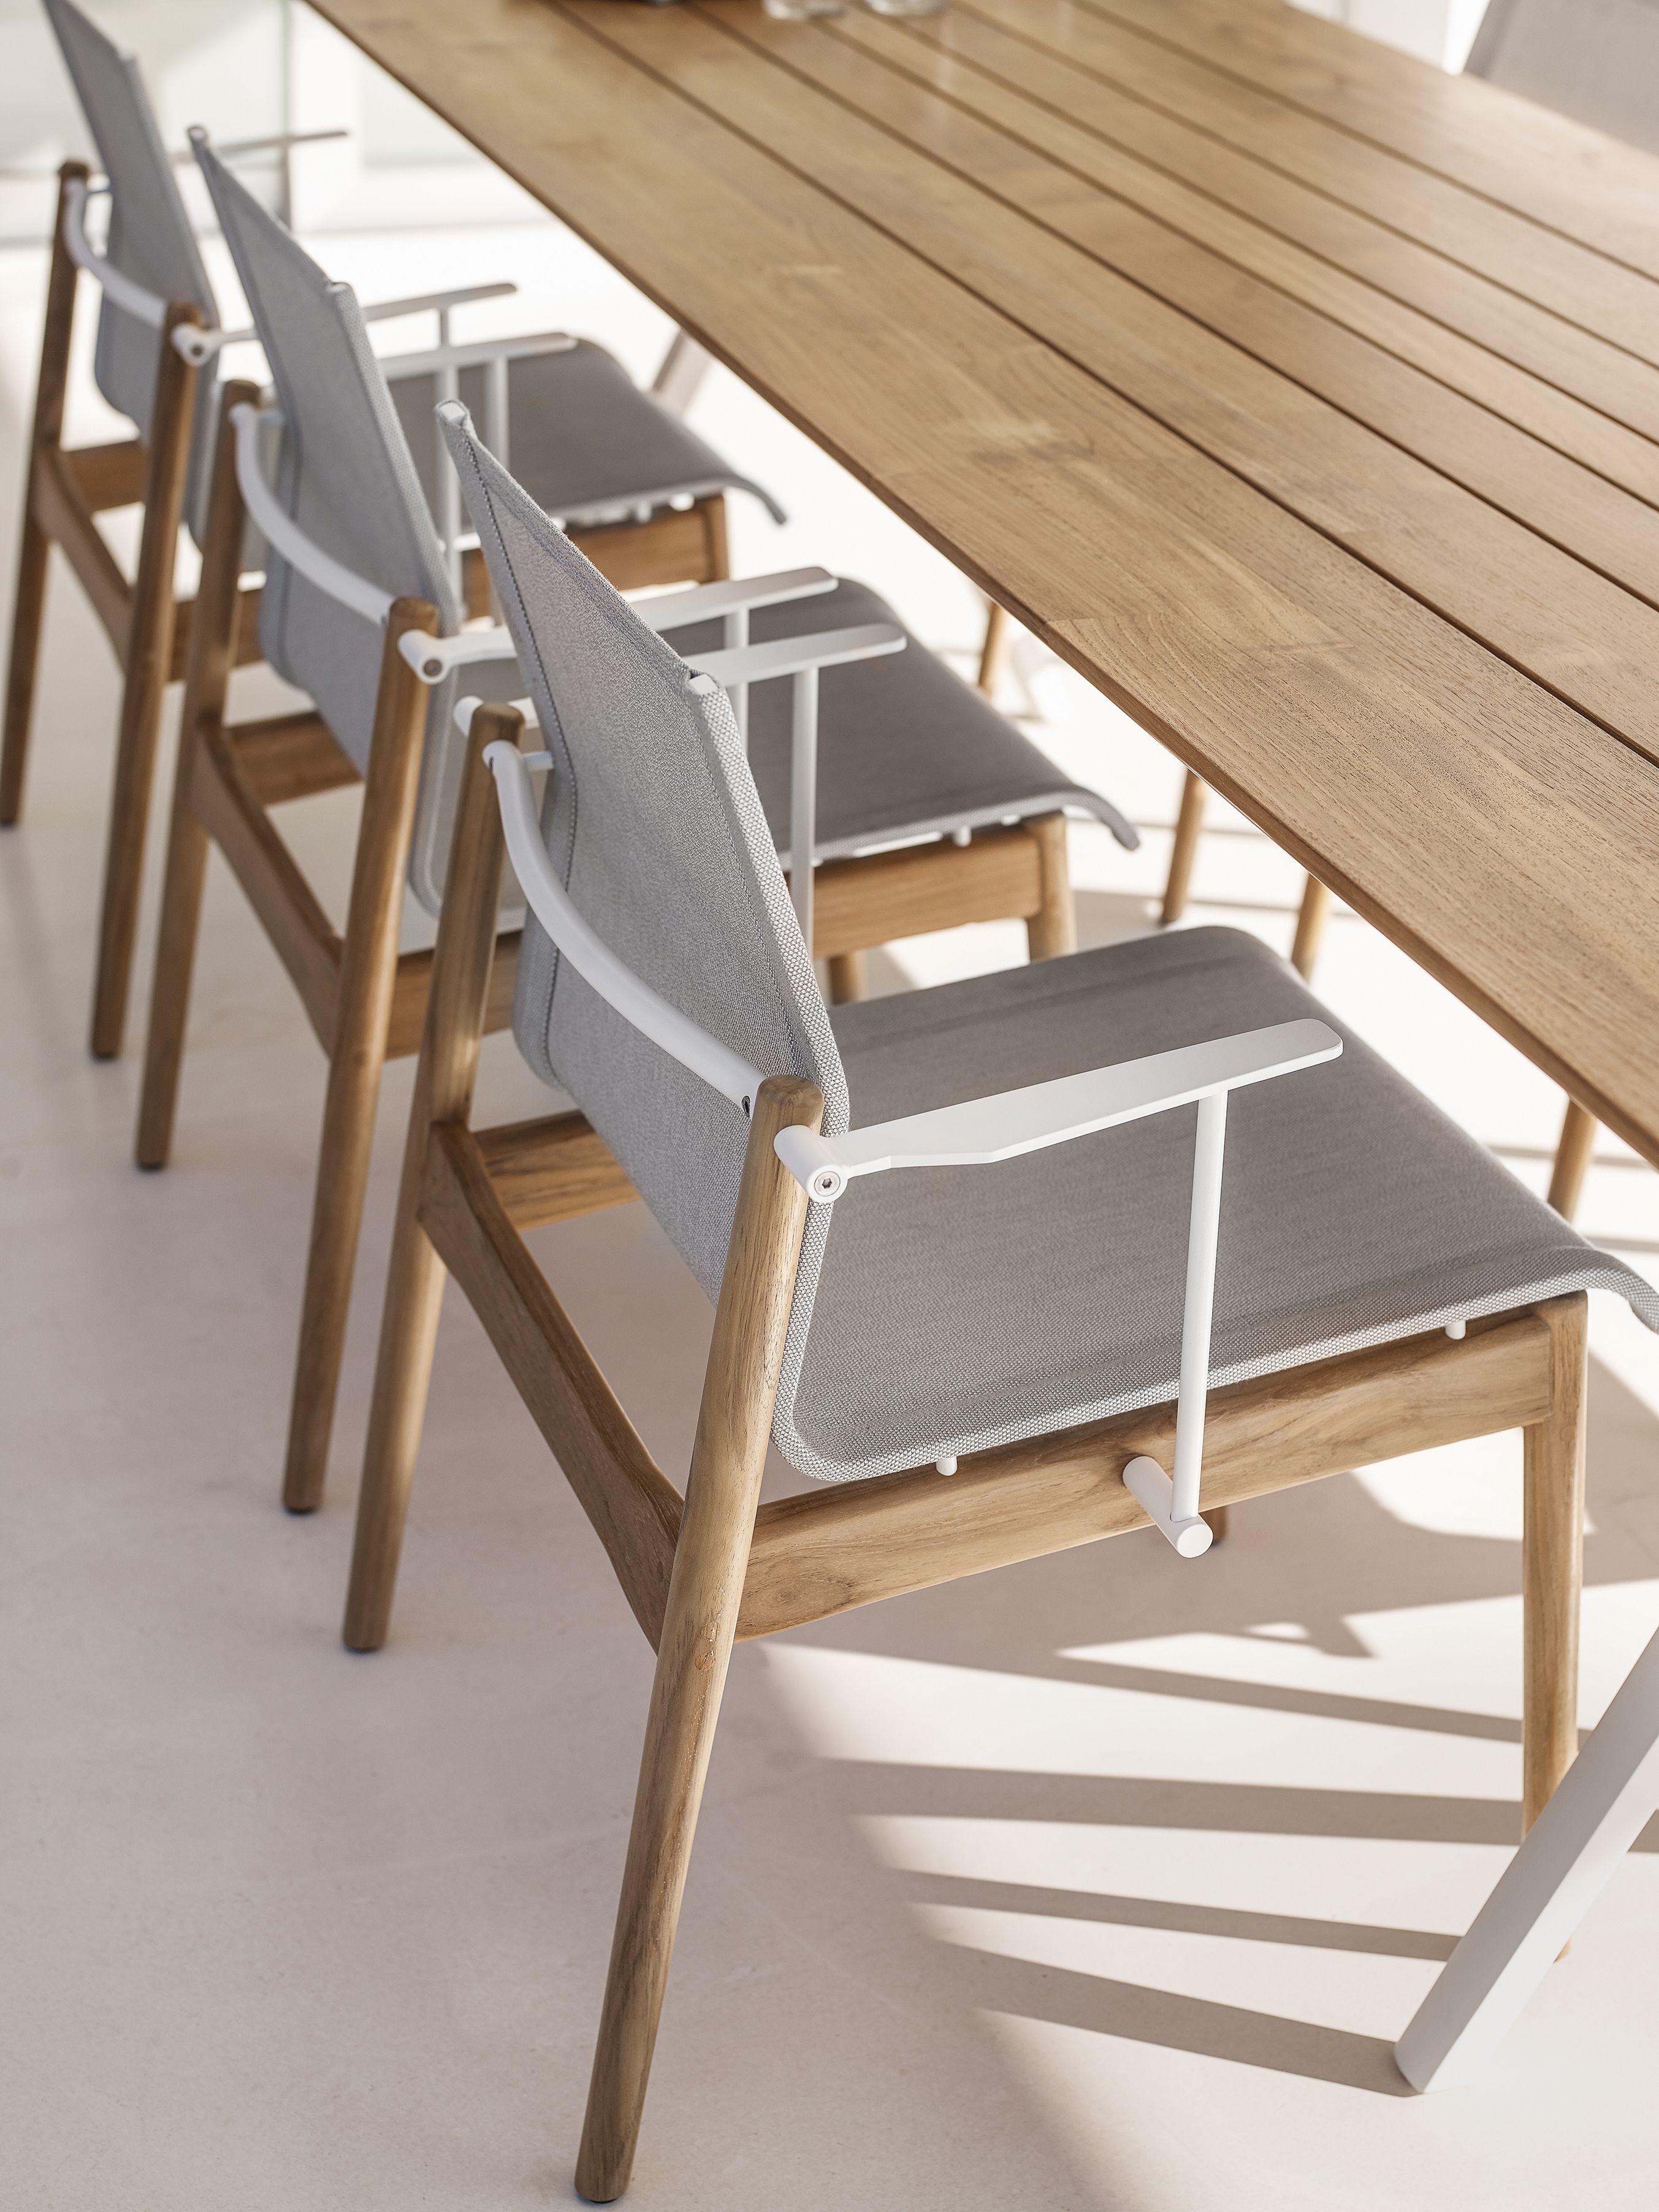 Gloster Sway Teak Chairs Split Table Teak Dining Chairs Teak Armchair Teak Chairs